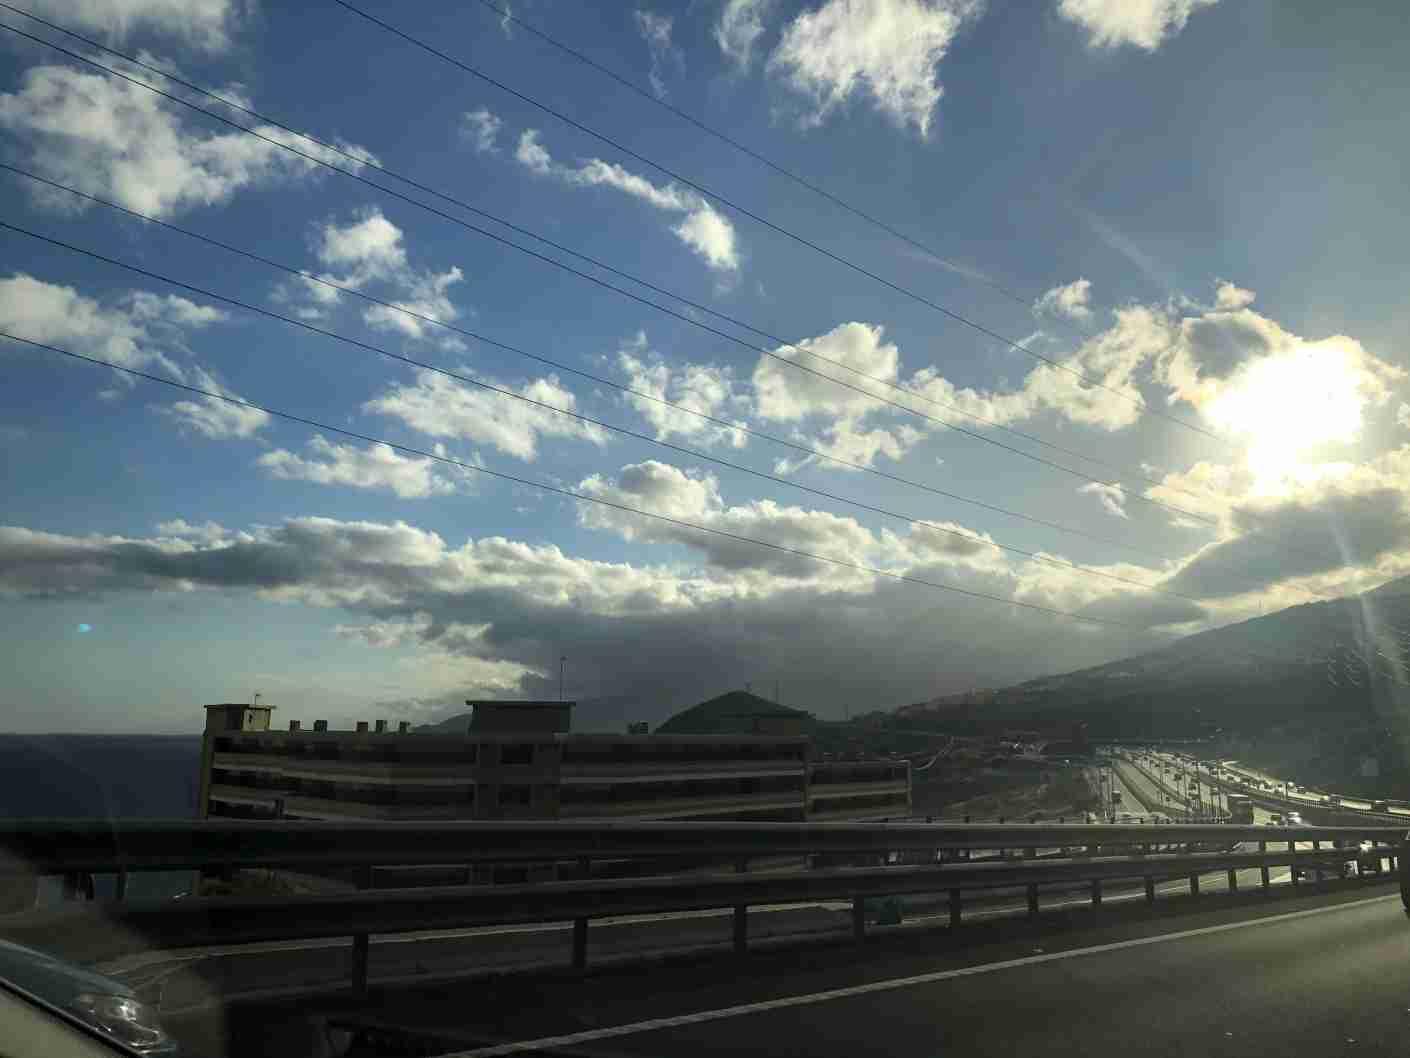 Views along the drive